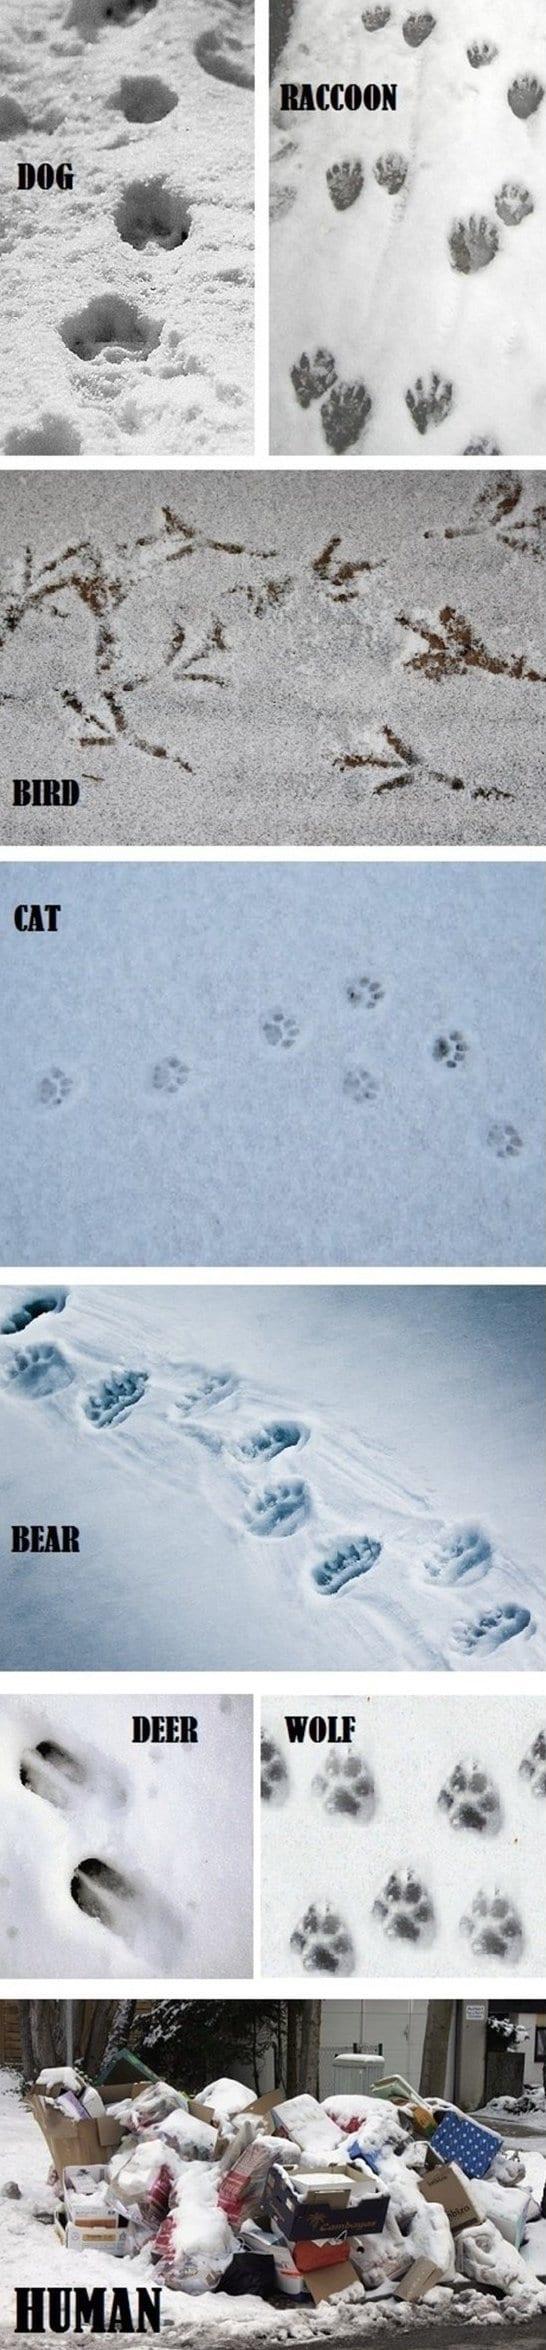 2014-jokes-tracks-in-the-snow